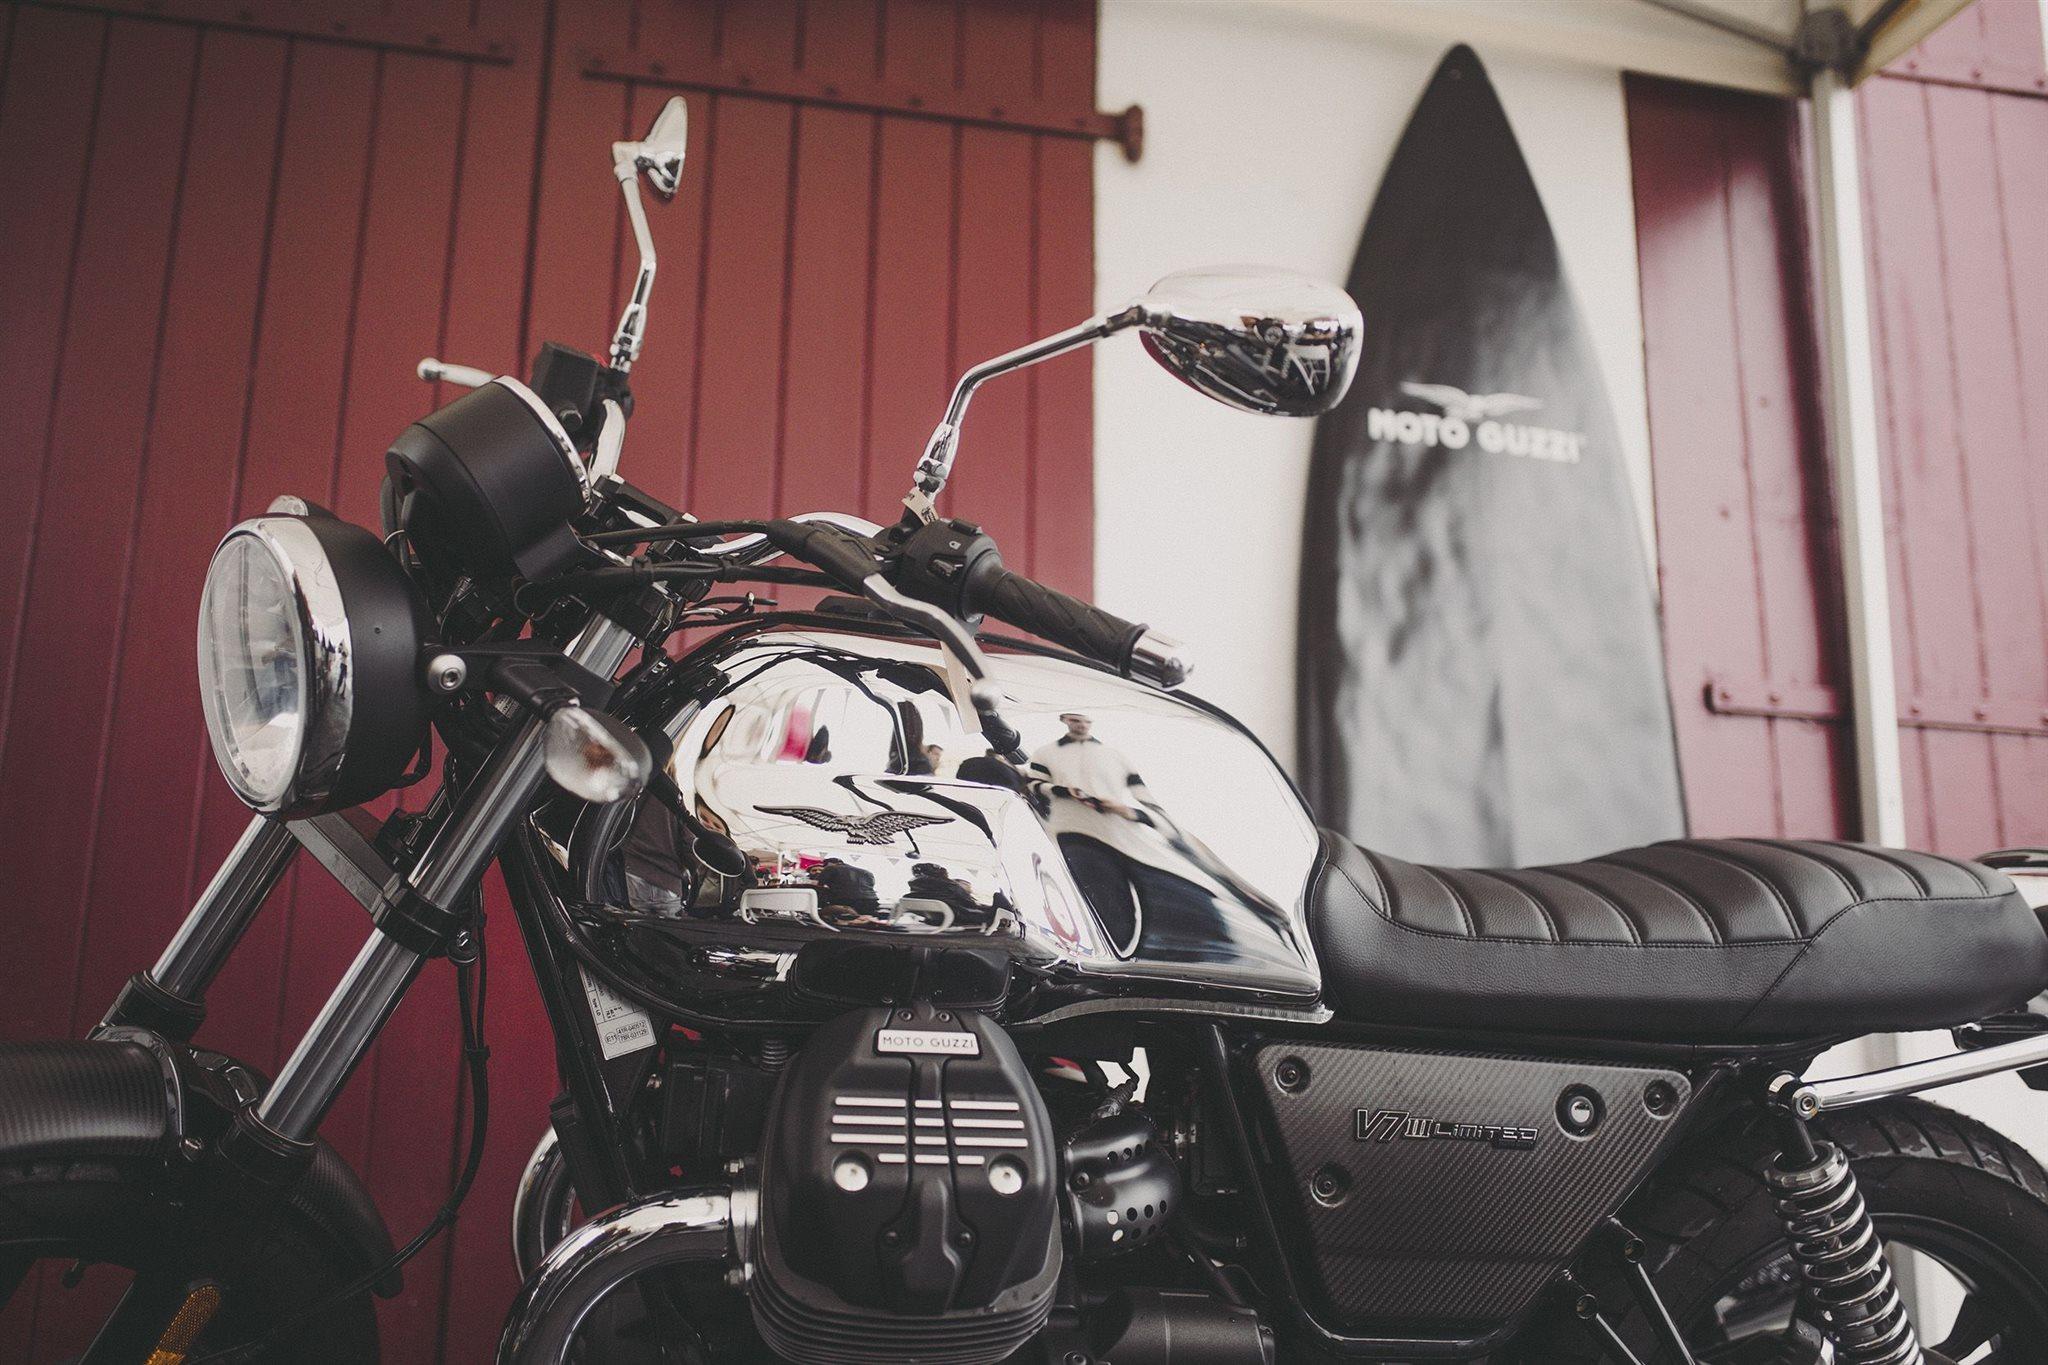 Moto Guzzi V7 III Limited